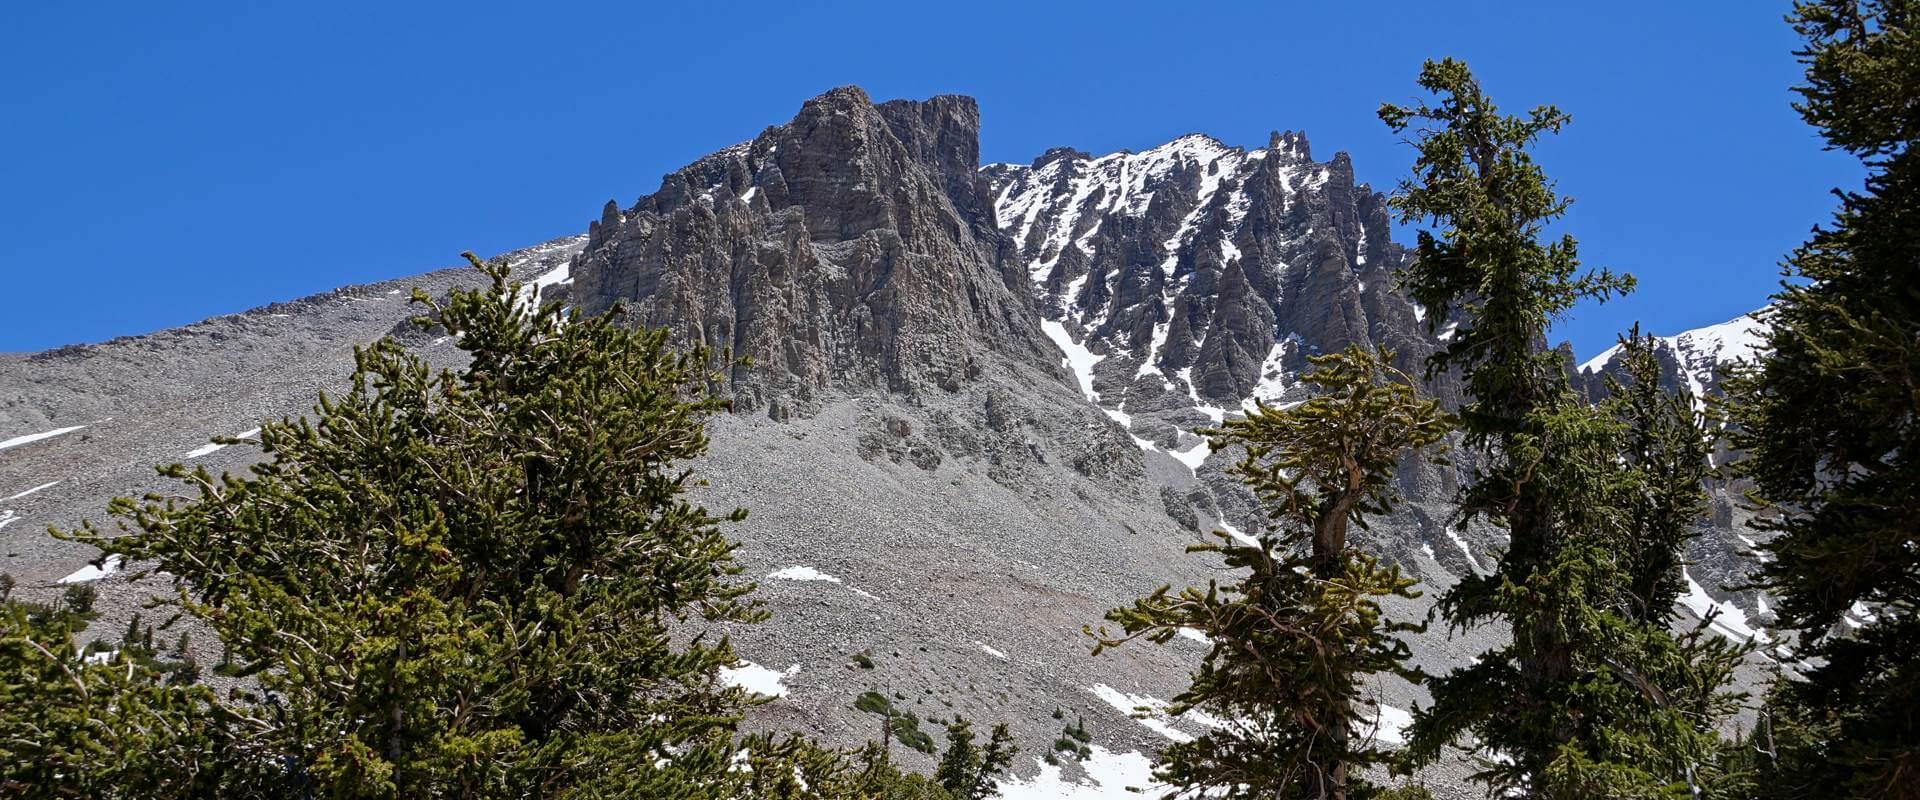 Great Basin National Park – zu Besuch bei den ältesten Bäumen der Welt